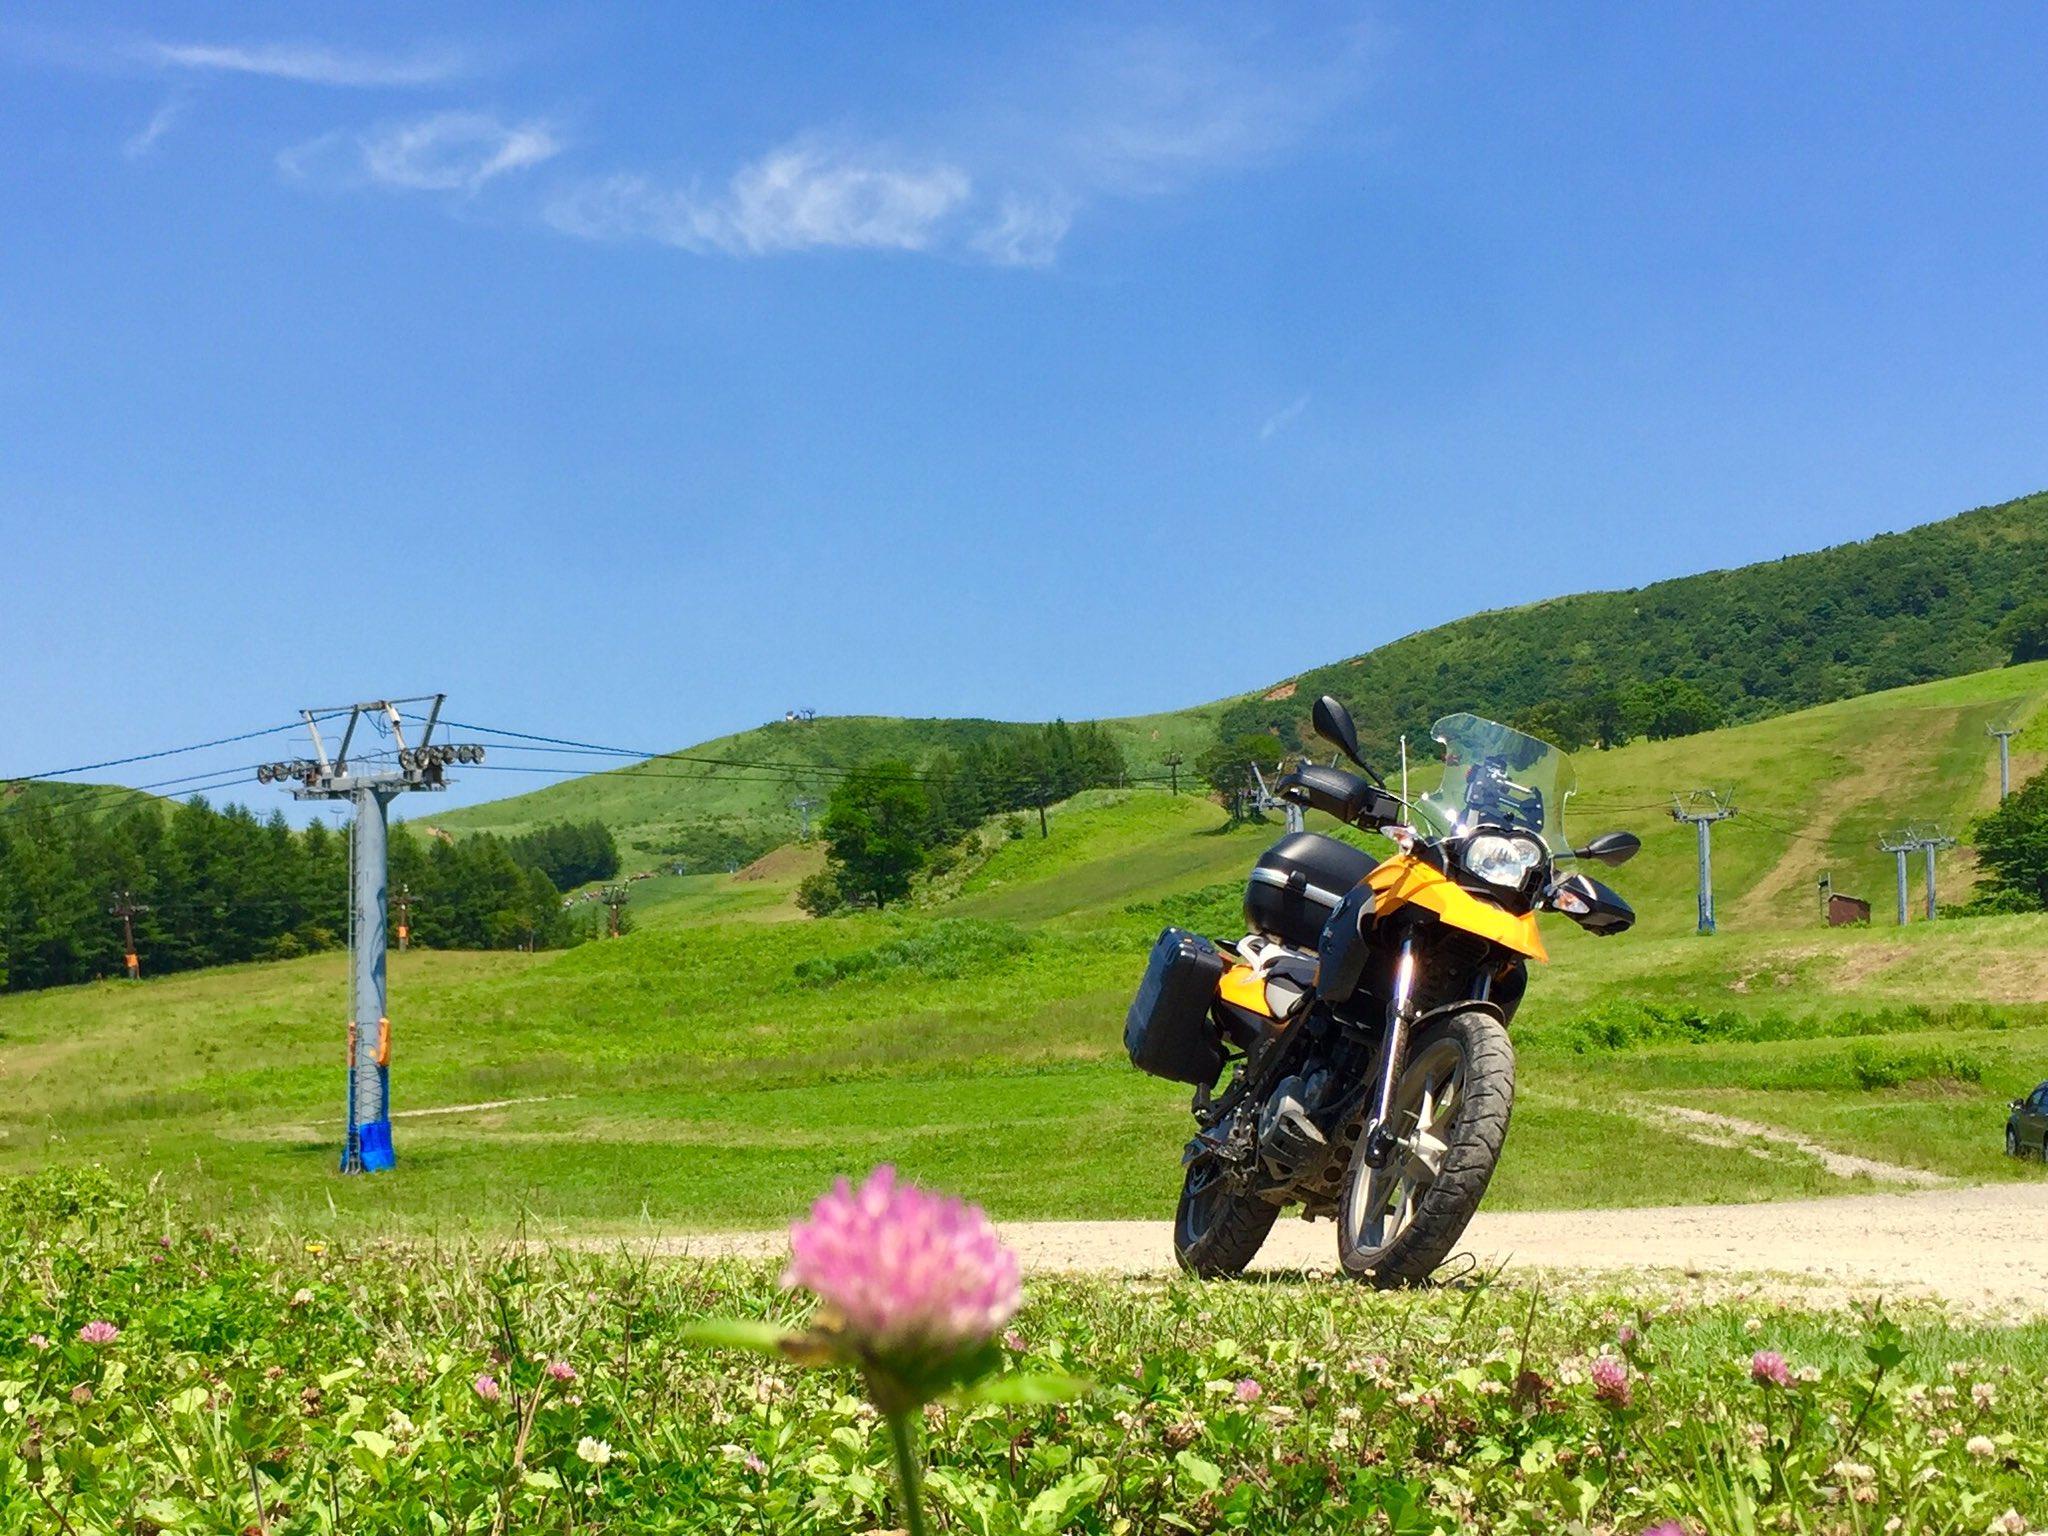 G650GS-林道 瀞川氷ノ山線